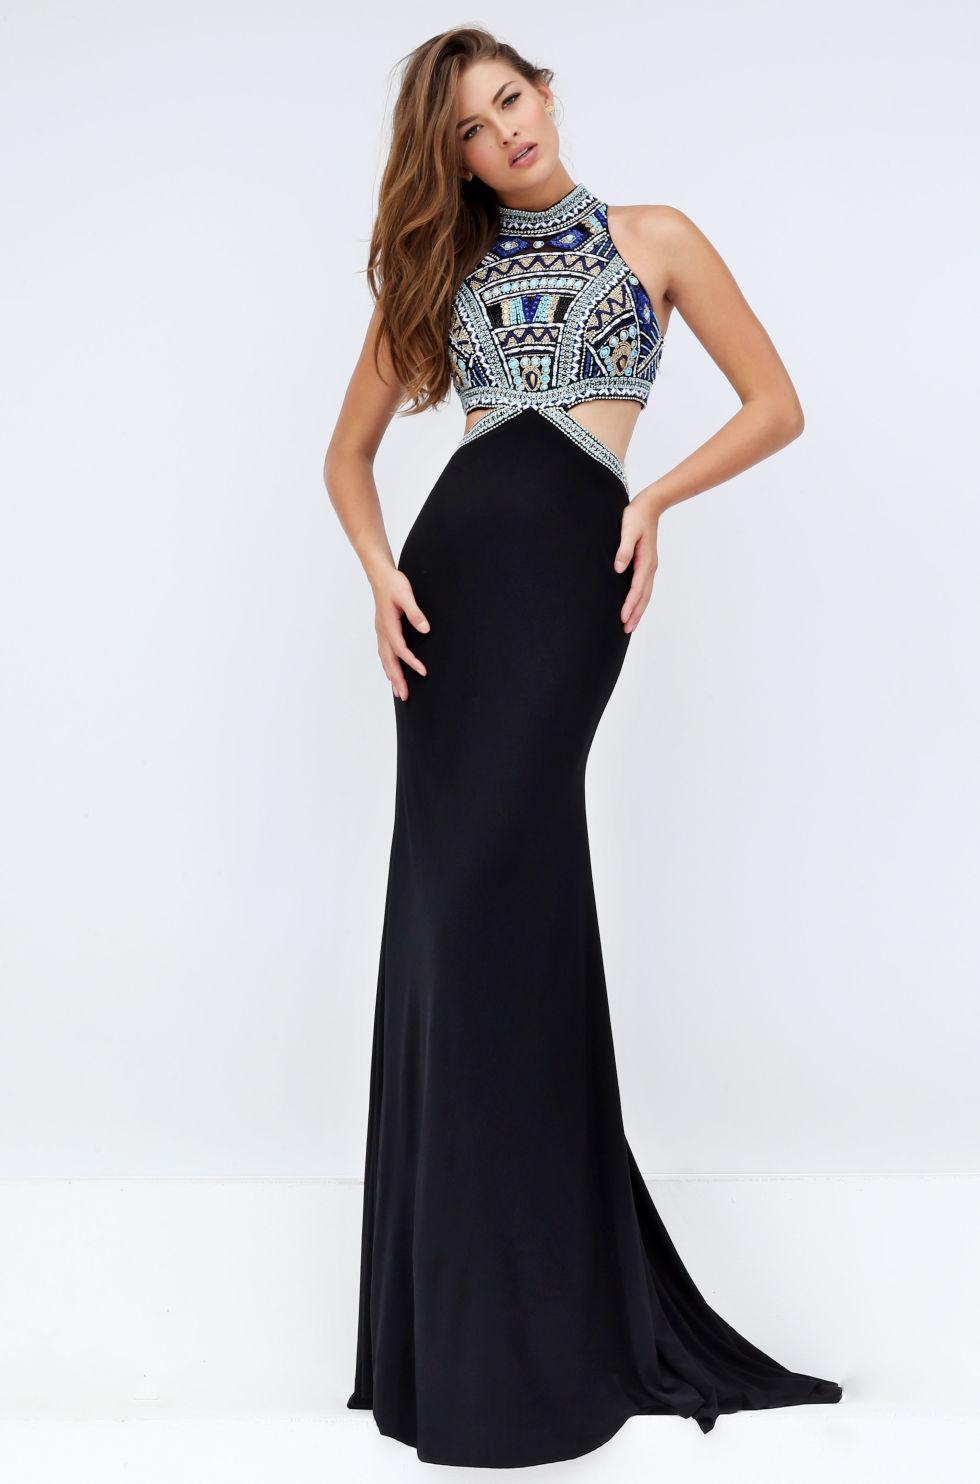 Prom Dress Trends